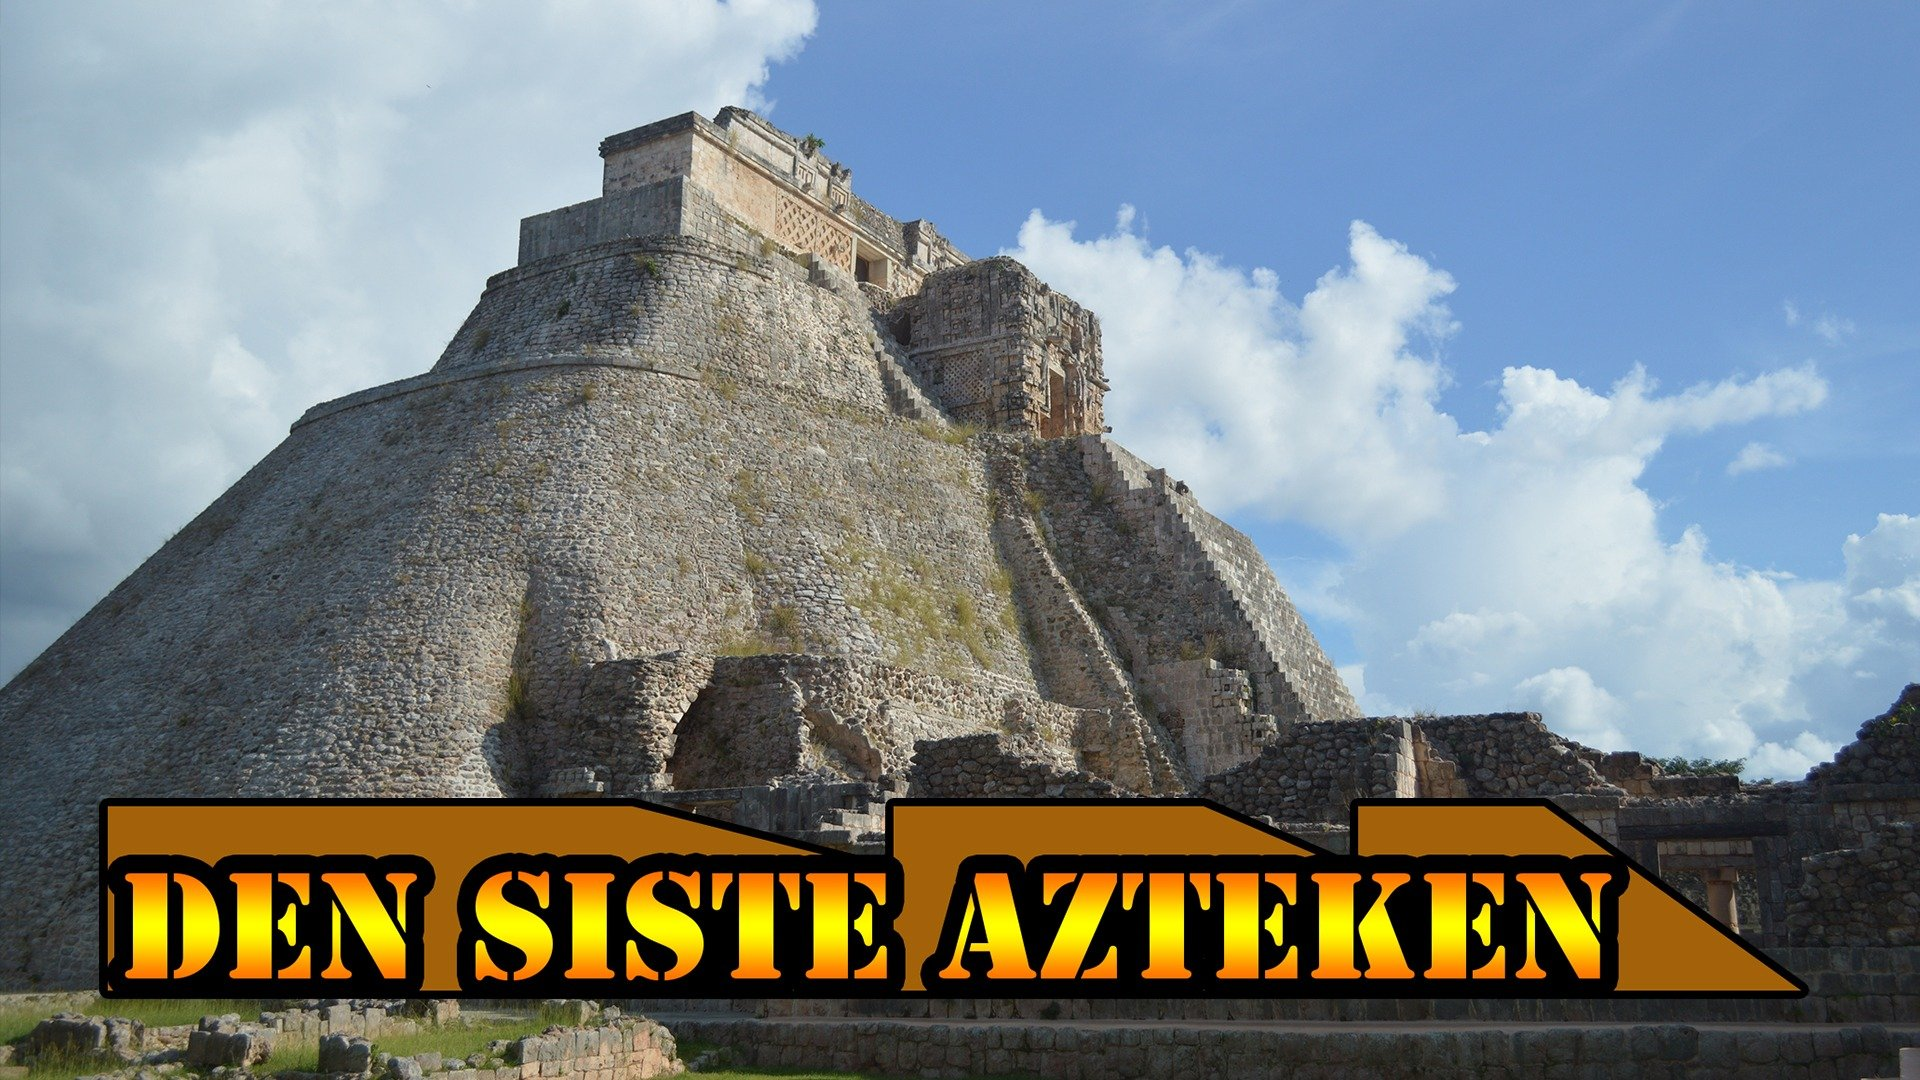 Den siste azteken